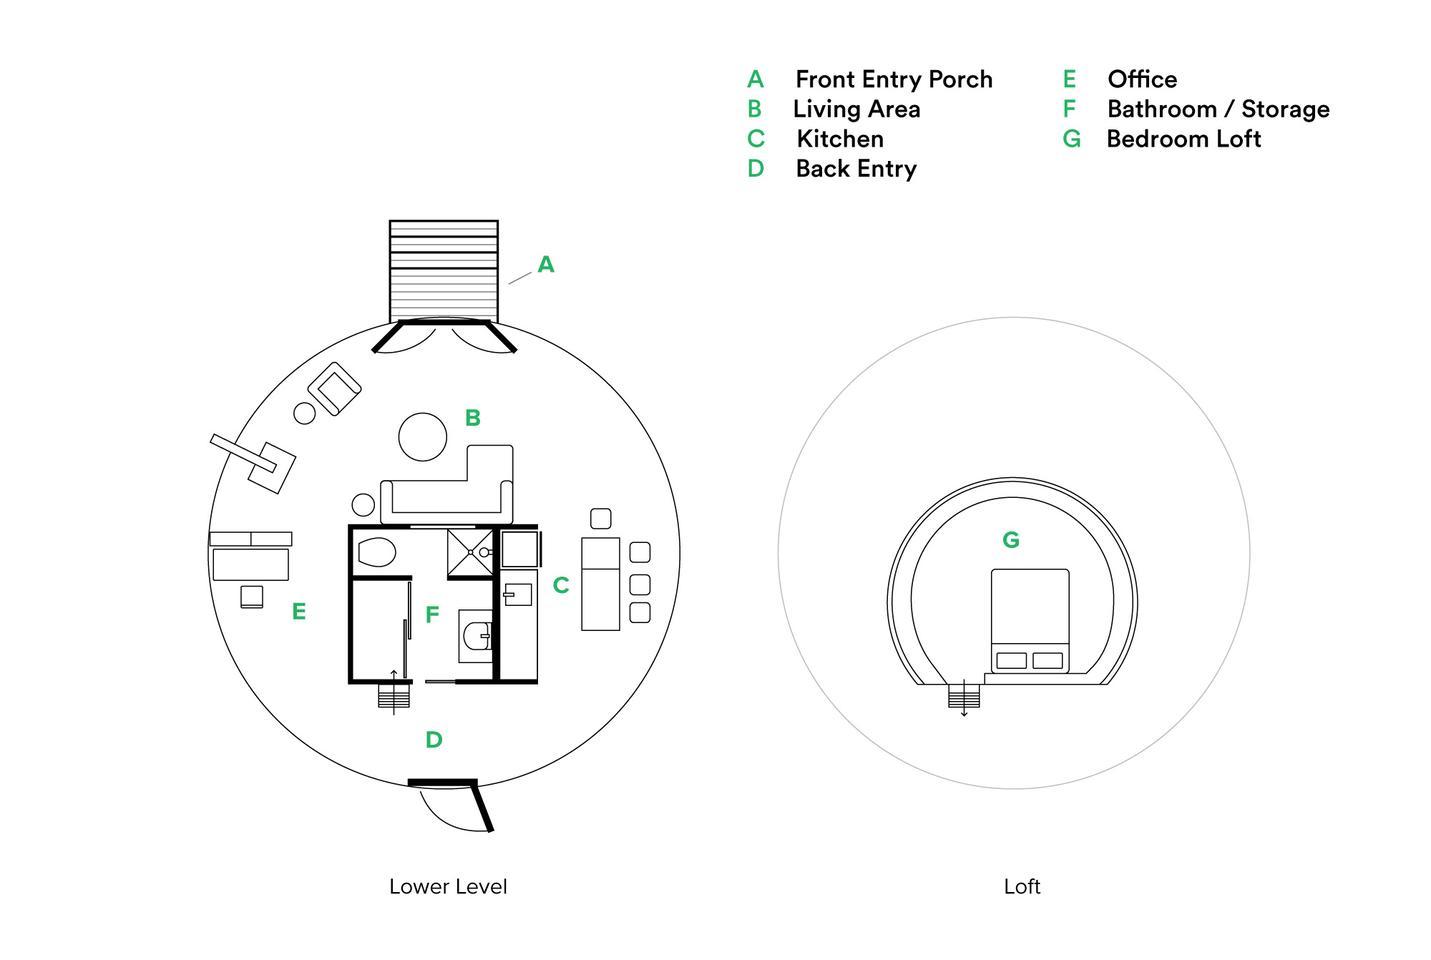 Oregon Couple Build Stunning Botanical Yurt Share Diy Guide Online